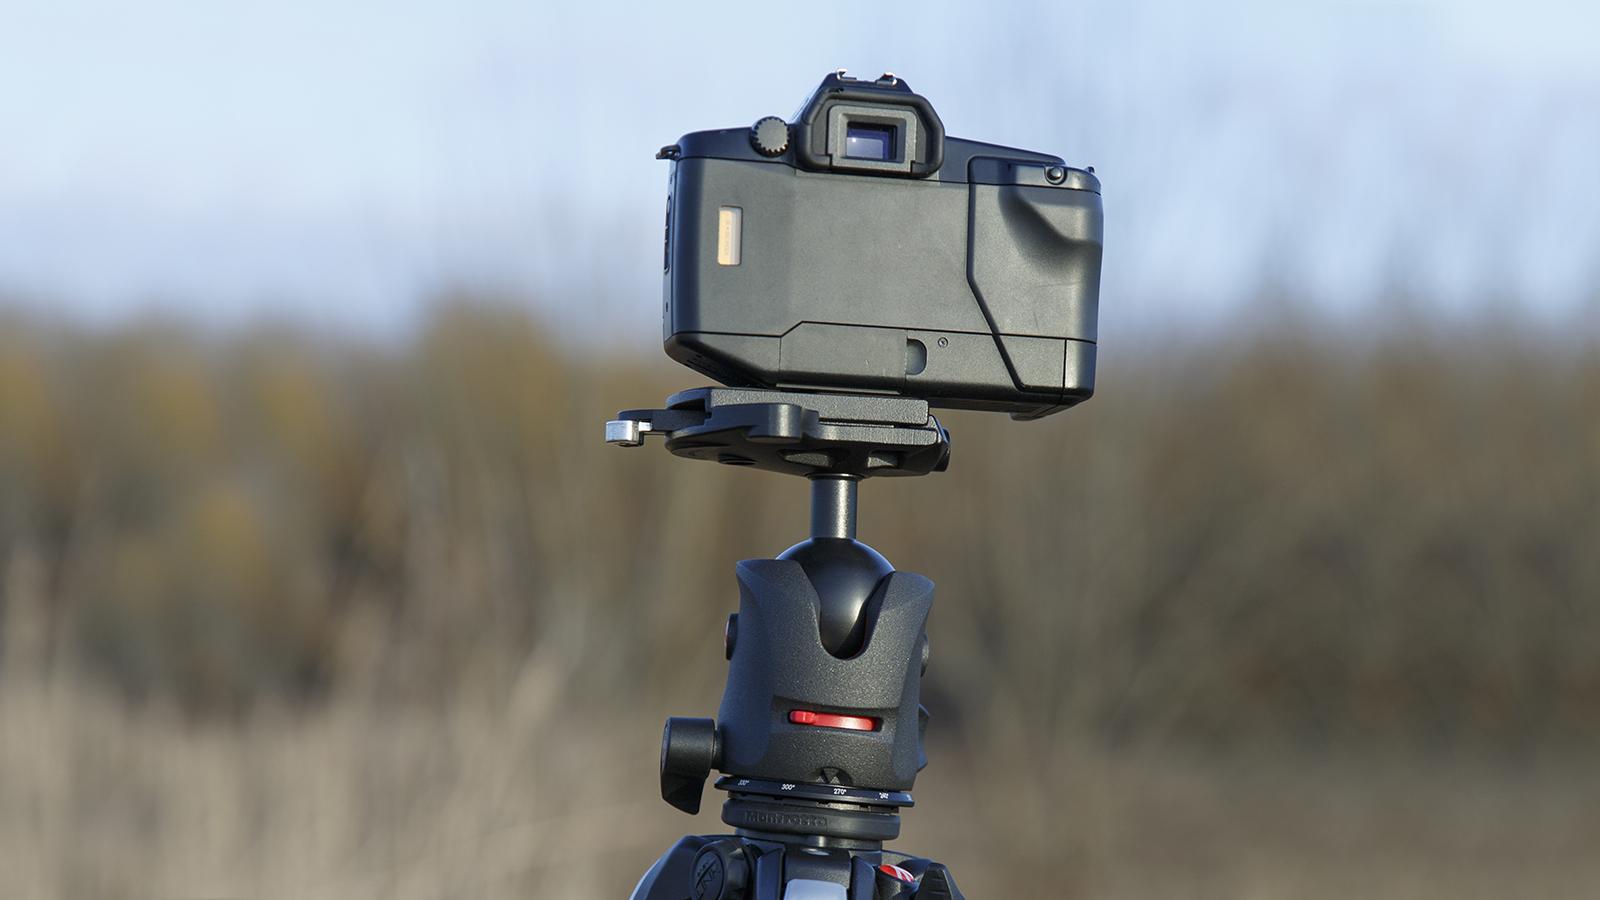 Manfrotto MH055M0-RC4 kuulpea koos Canon EOS650 kaameraga.